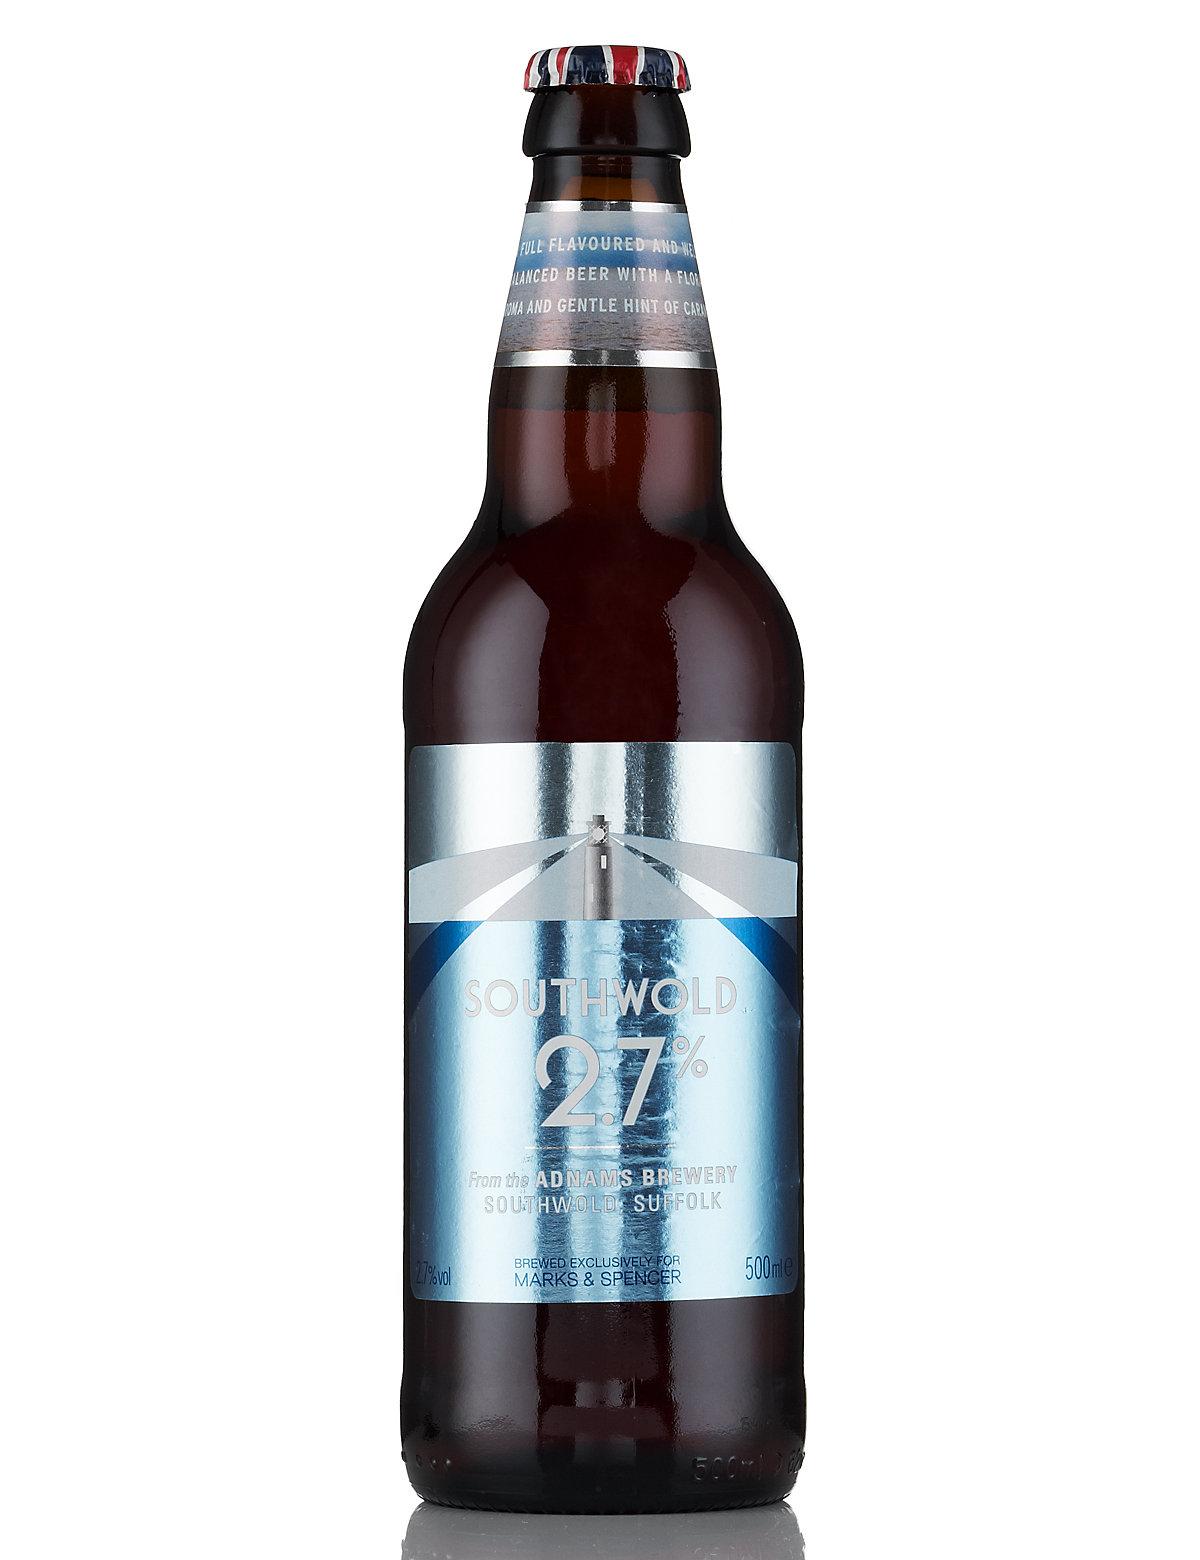 Southwold Low Alcohol Beer (20 bottles)